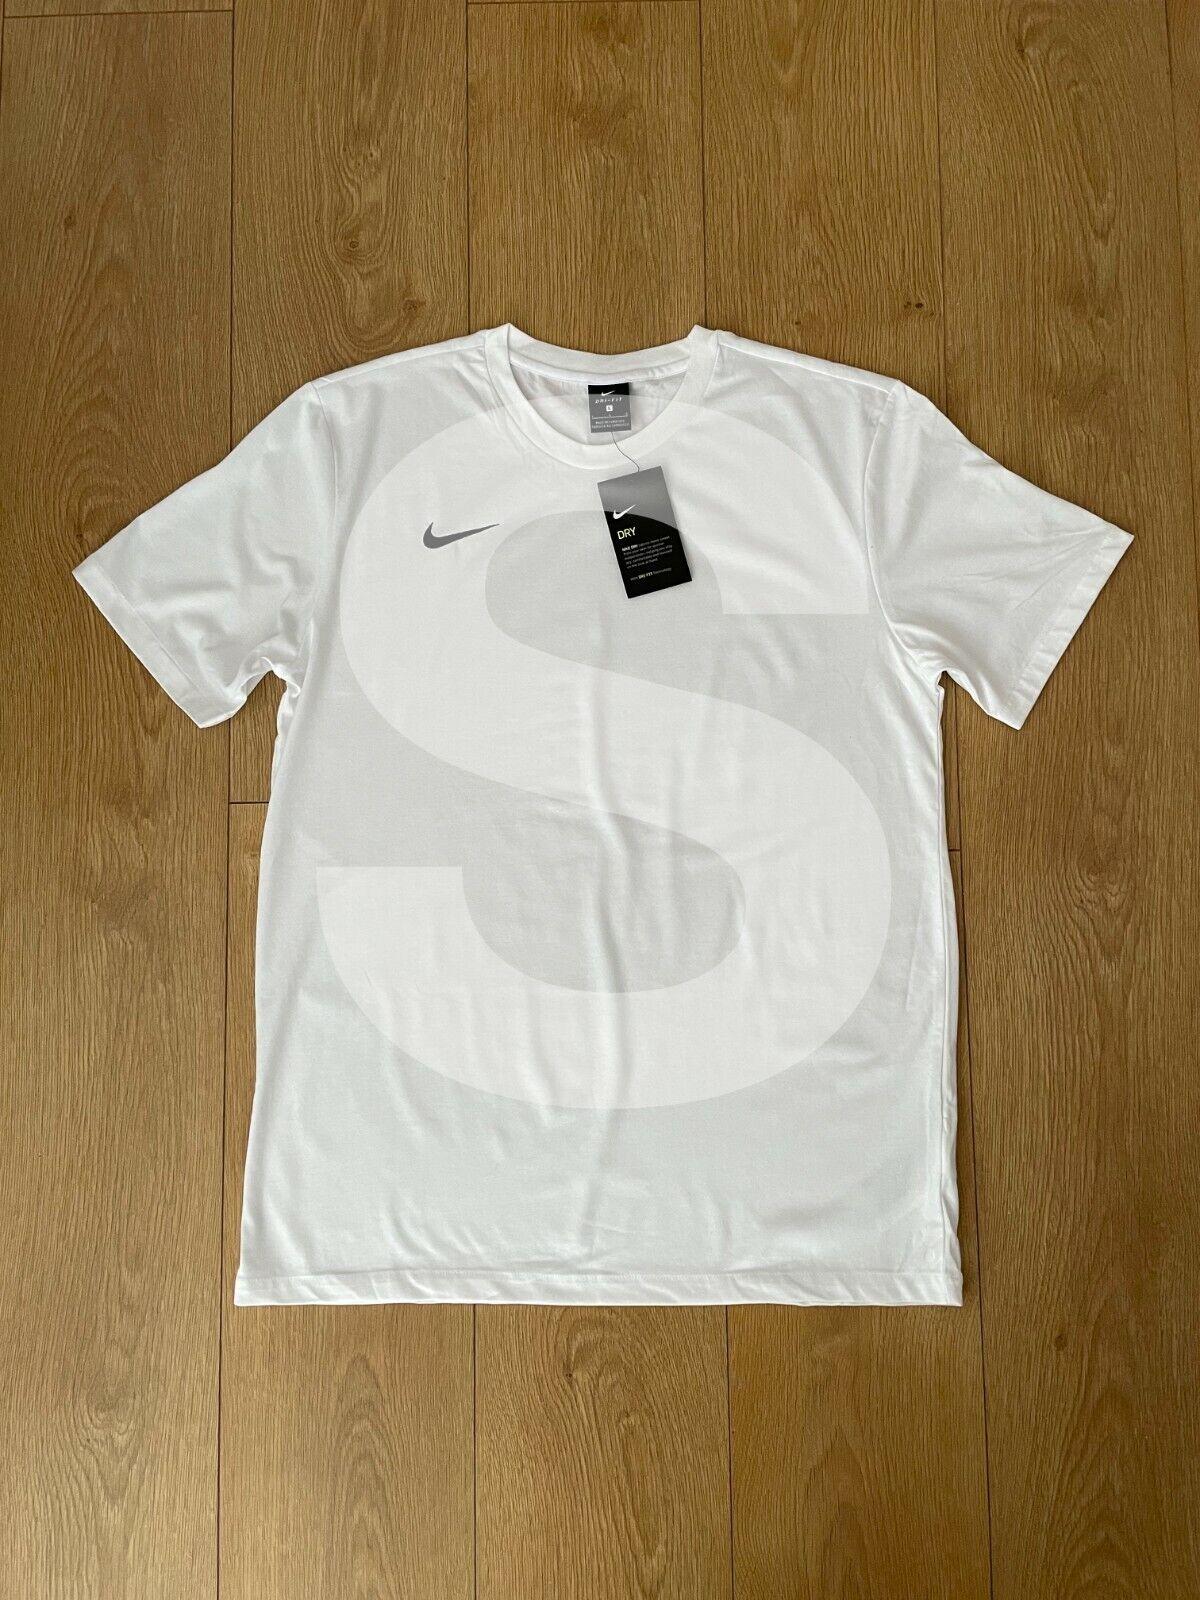 Nike Dri-Fit T-Shirt White Small Brand New